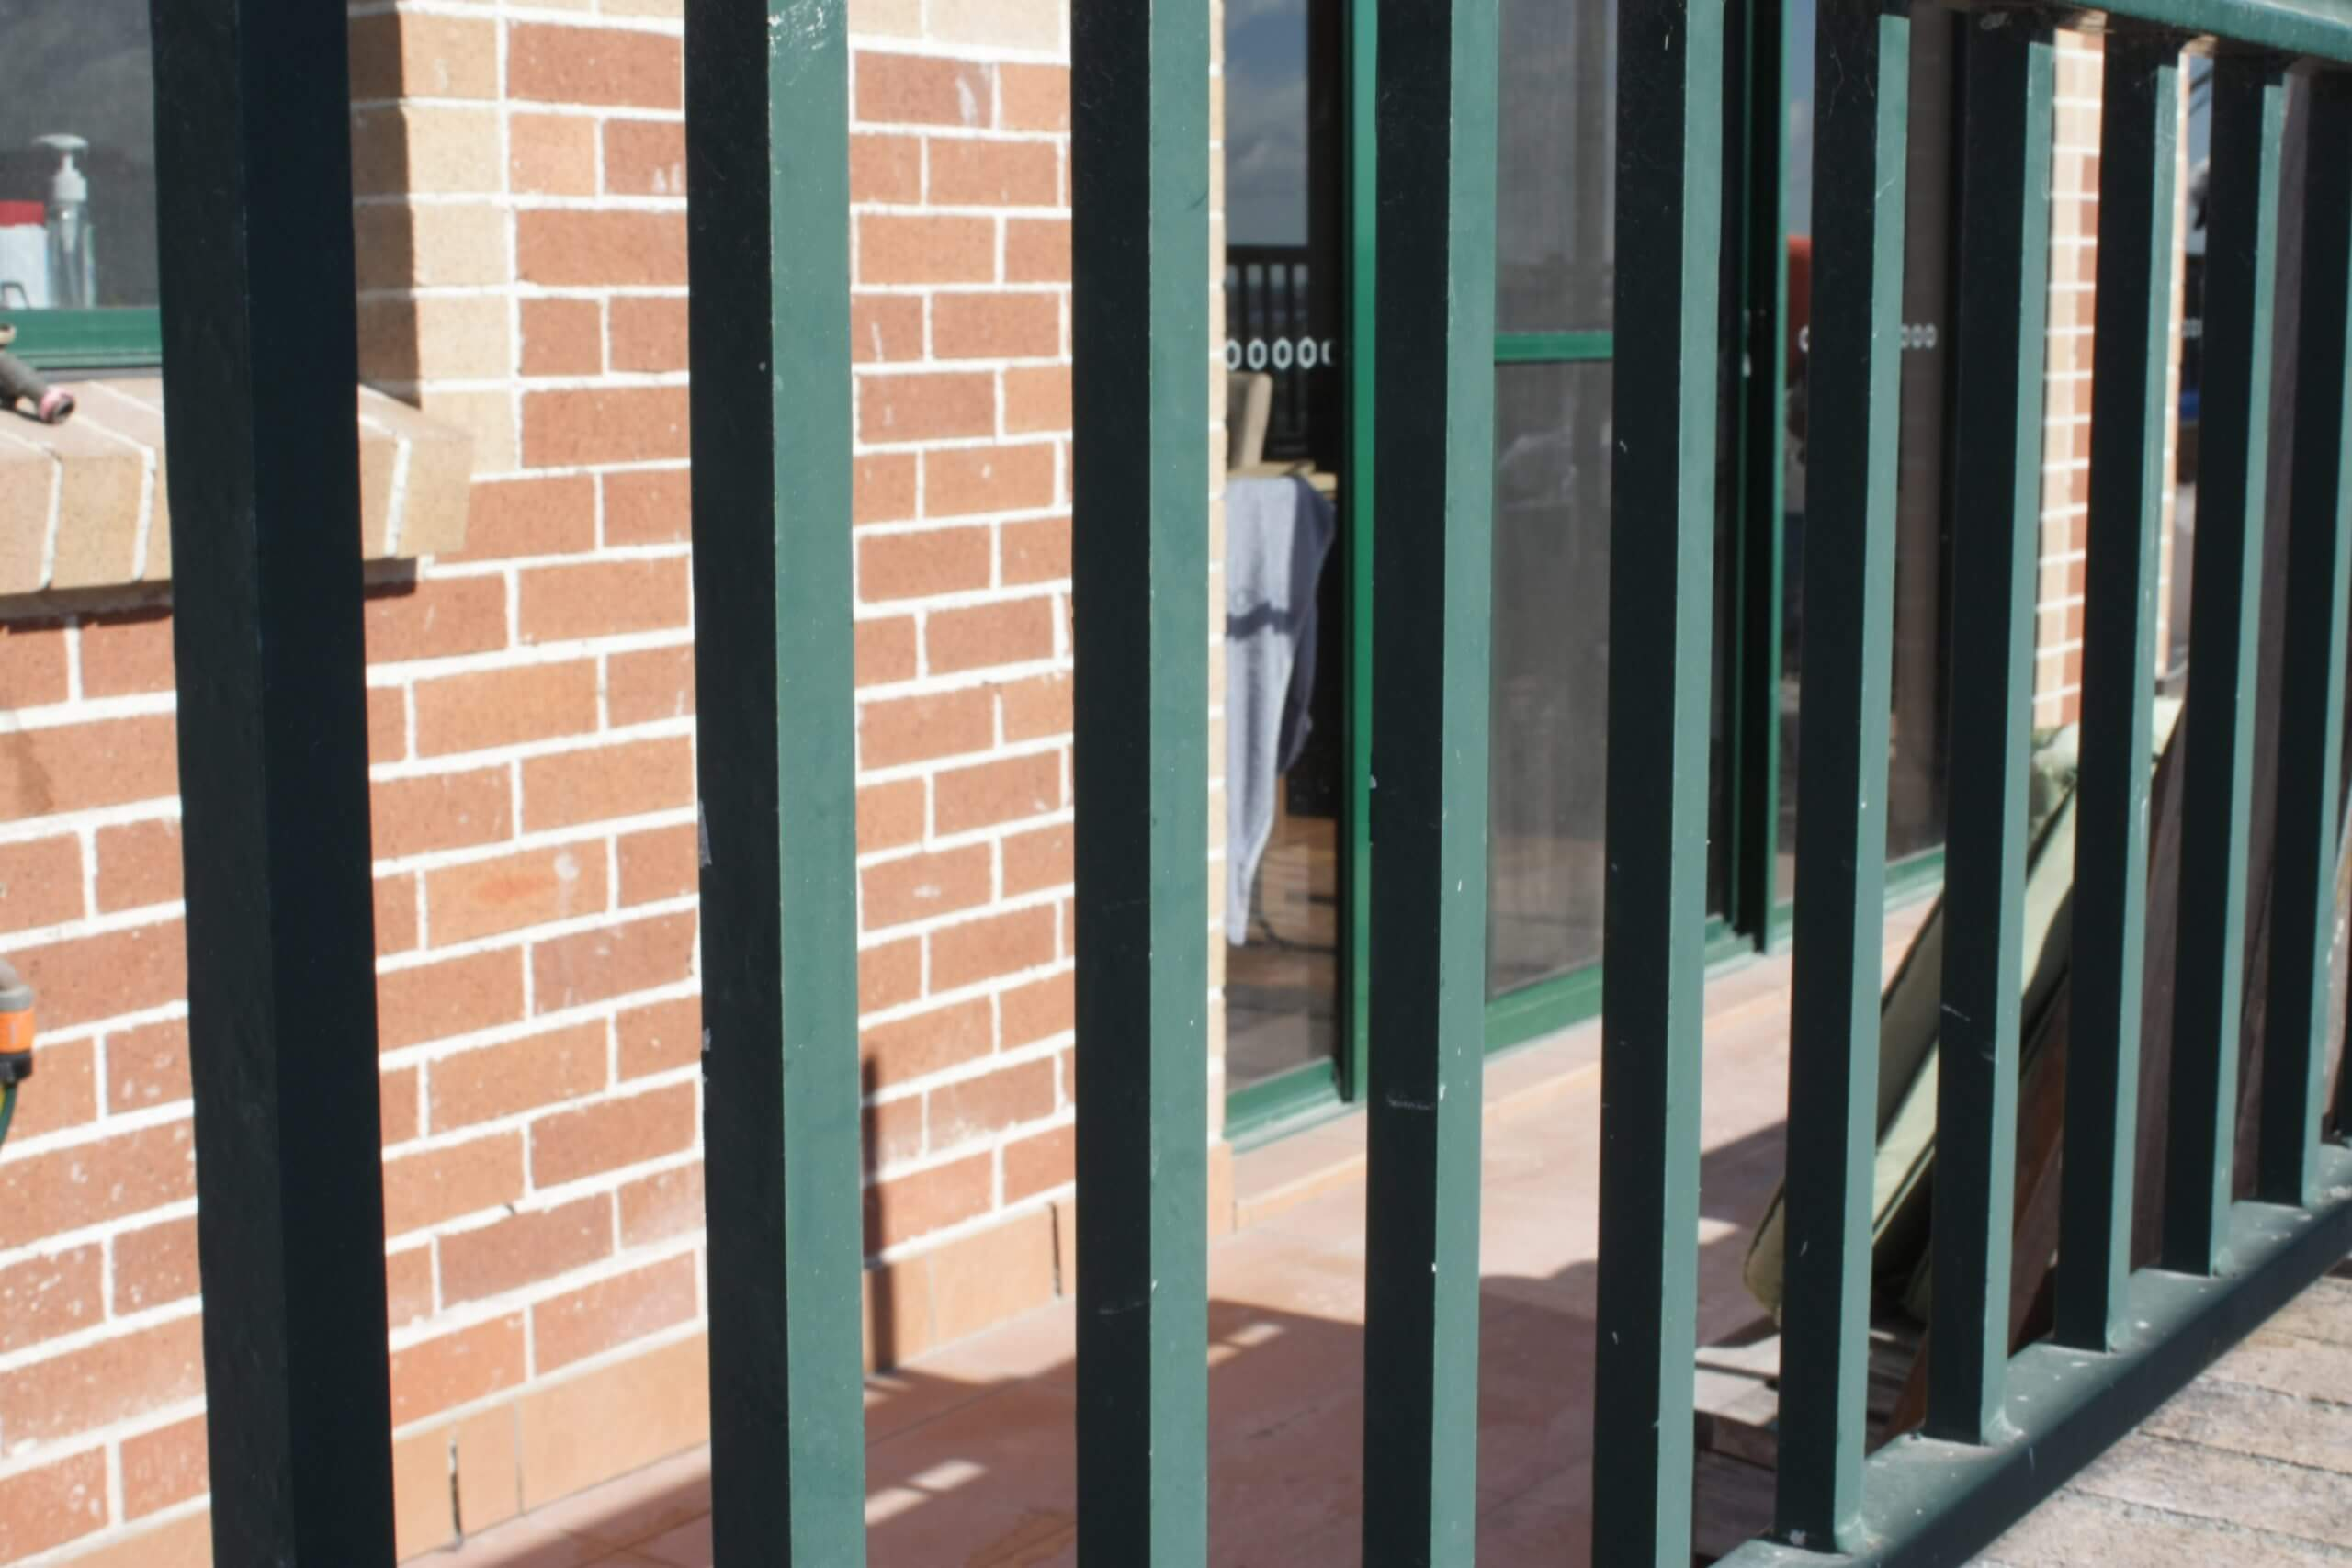 Balustrade - Façade Repair - Remedial Building Services